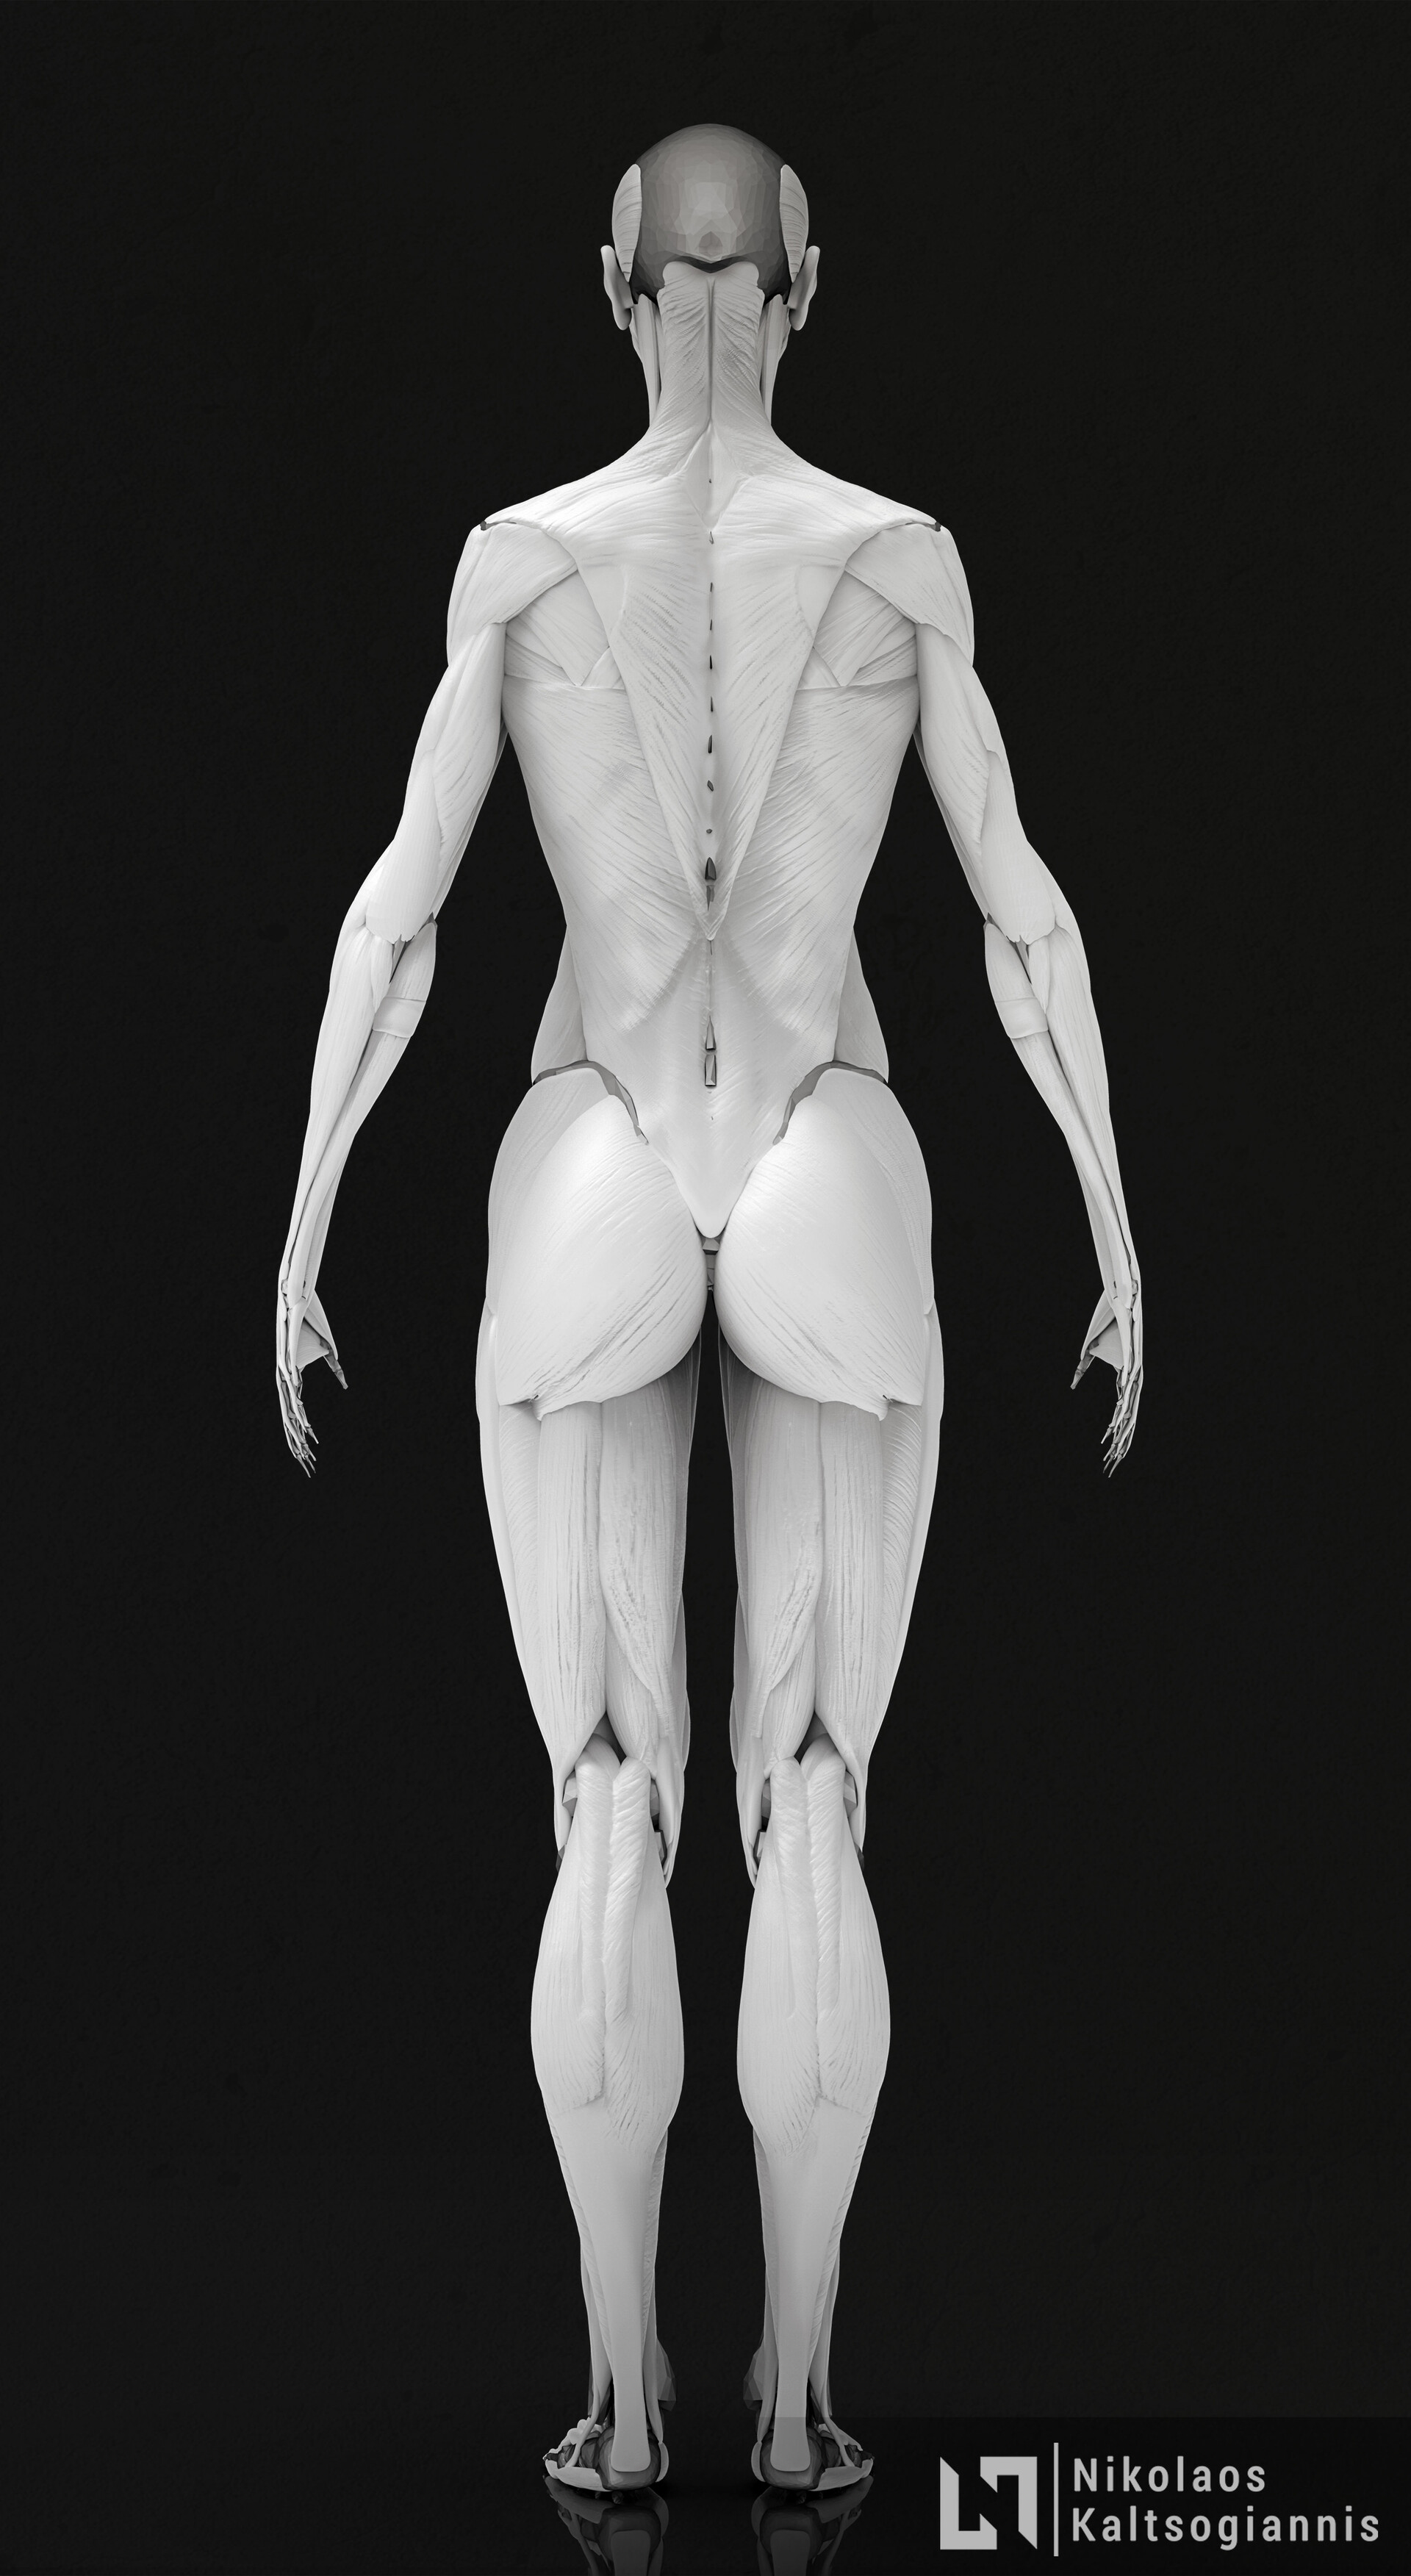 Nikolaos kaltsogiannis female anatomy echorche 04